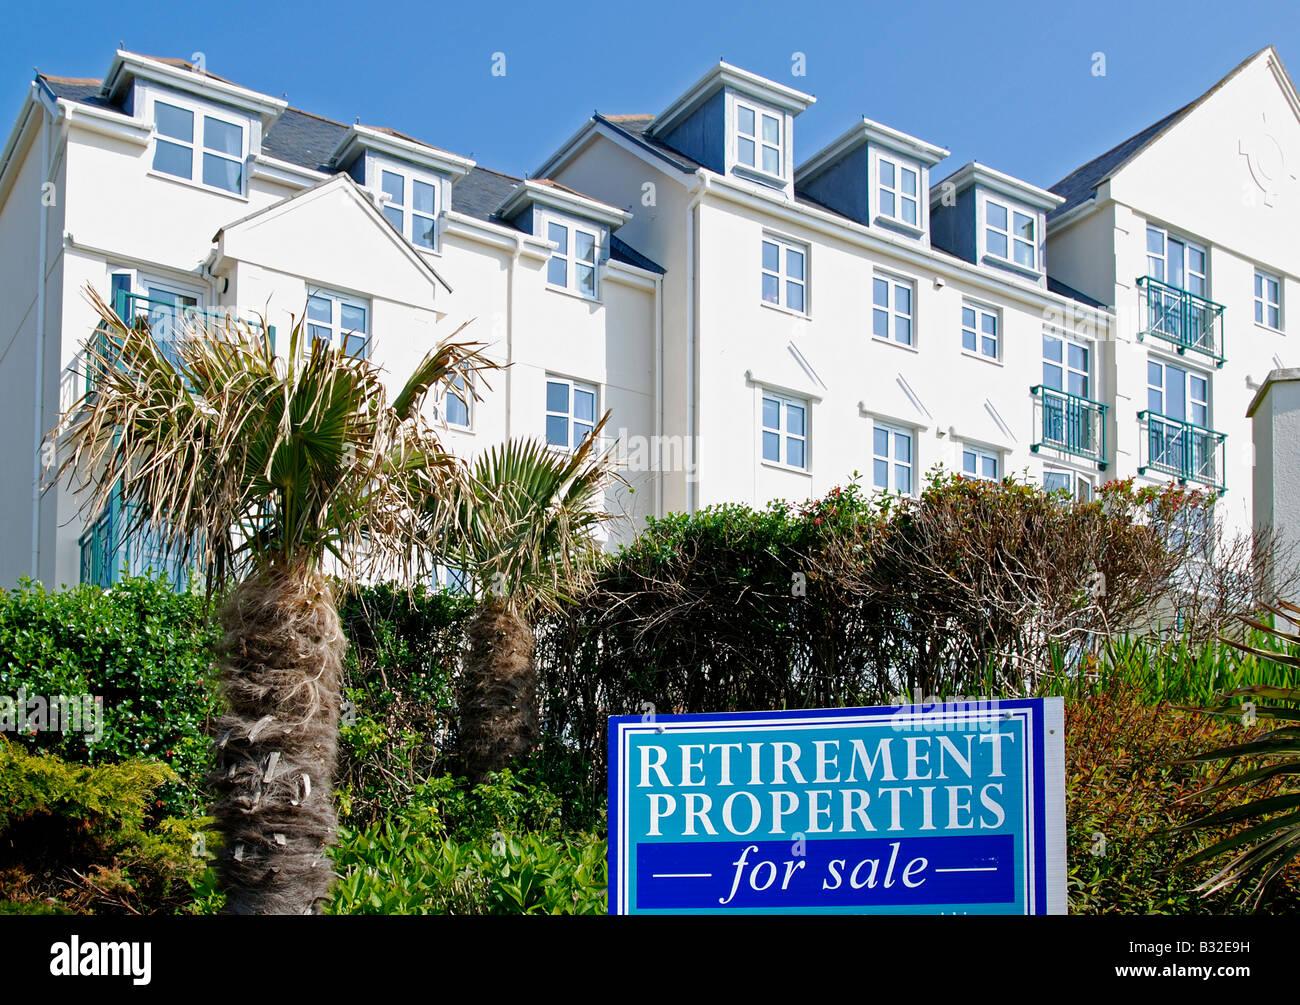 Strandpromenade-Ruhestand-Immobilien zum Verkauf in Falmouth, Cornwall, uk Stockbild